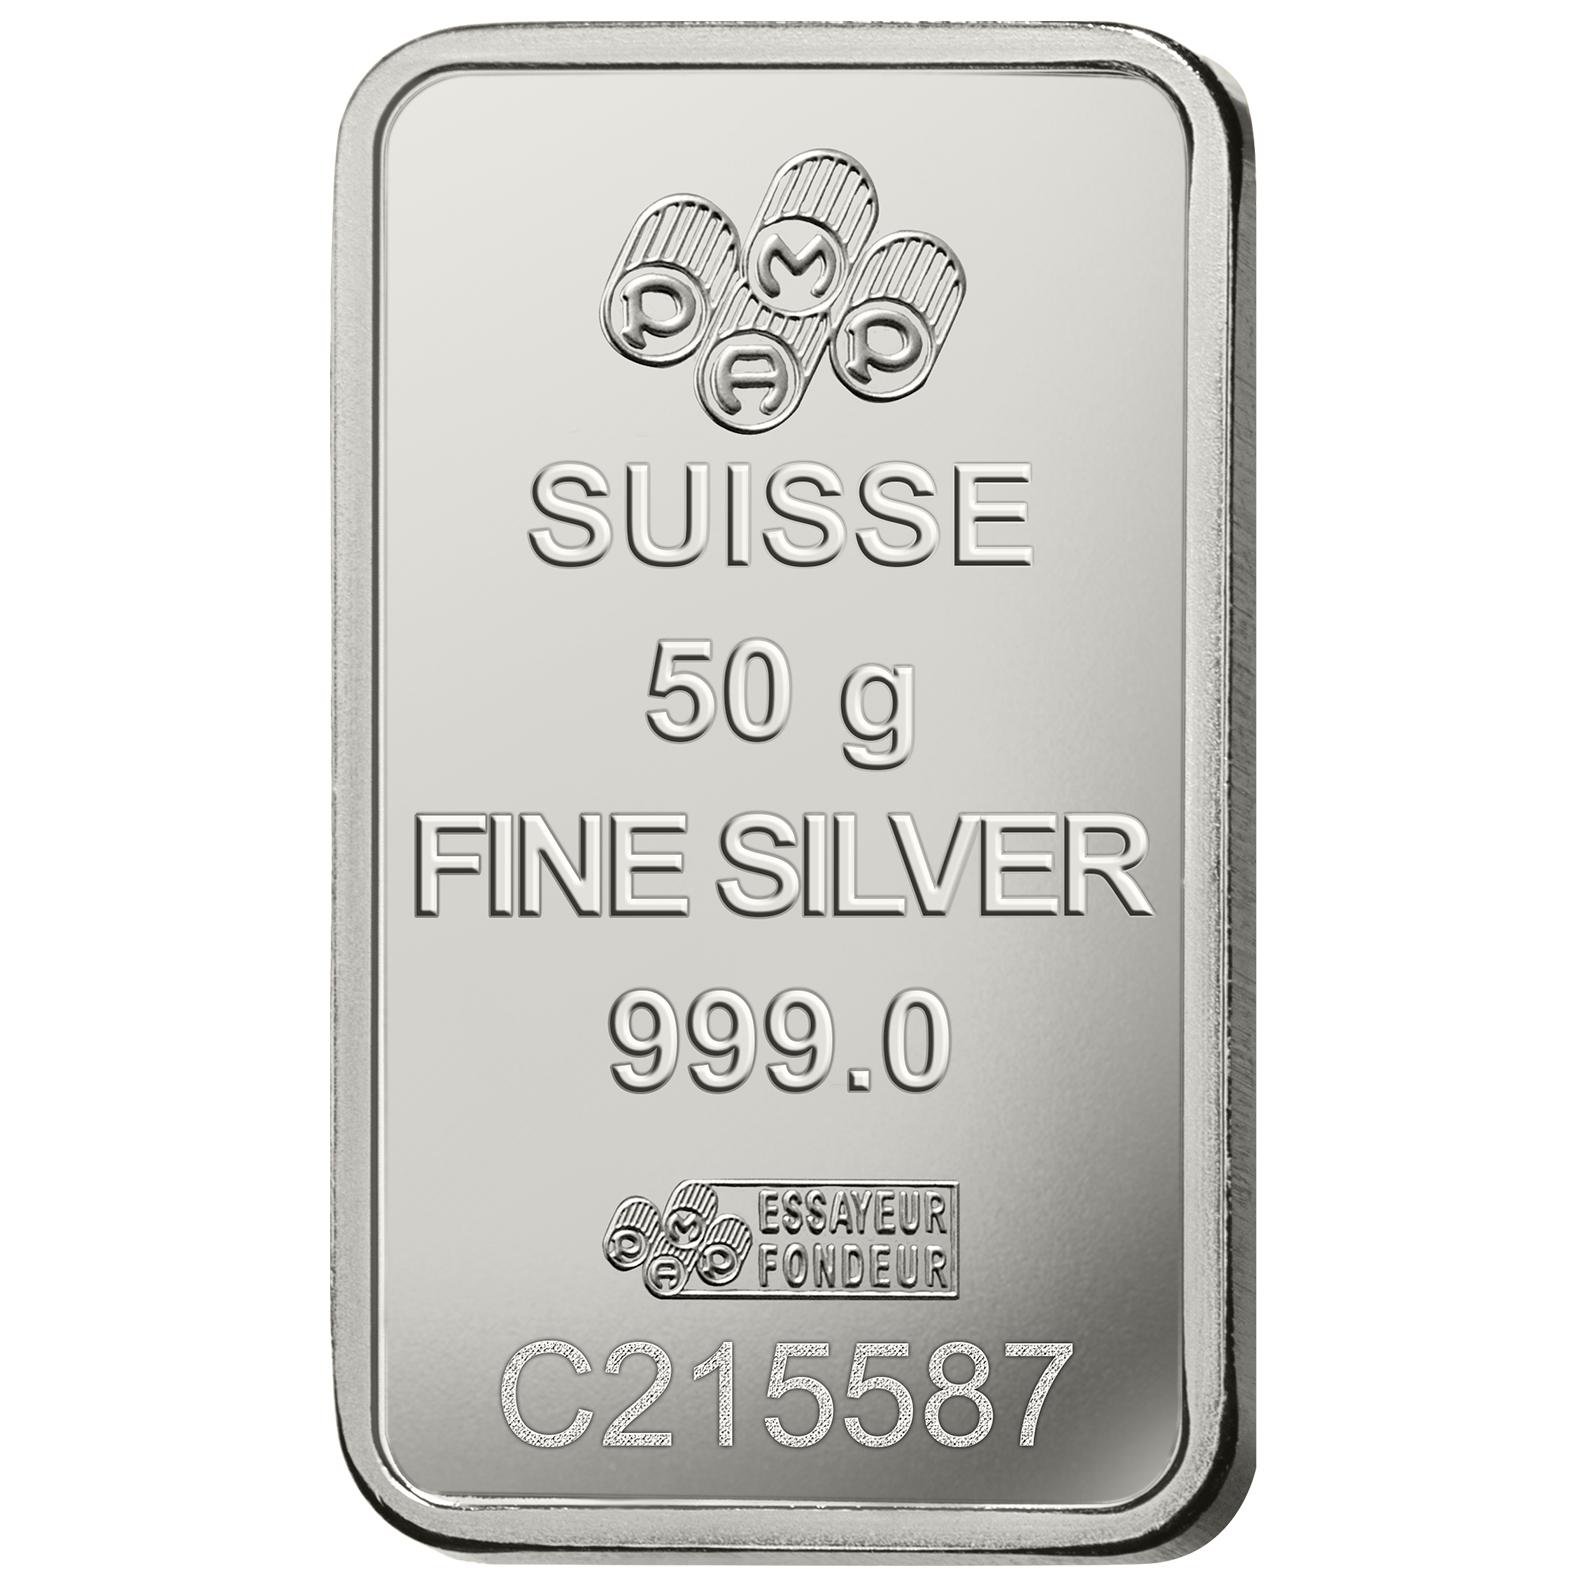 50 gram Silver Bar - PAMP Suisse Rosa